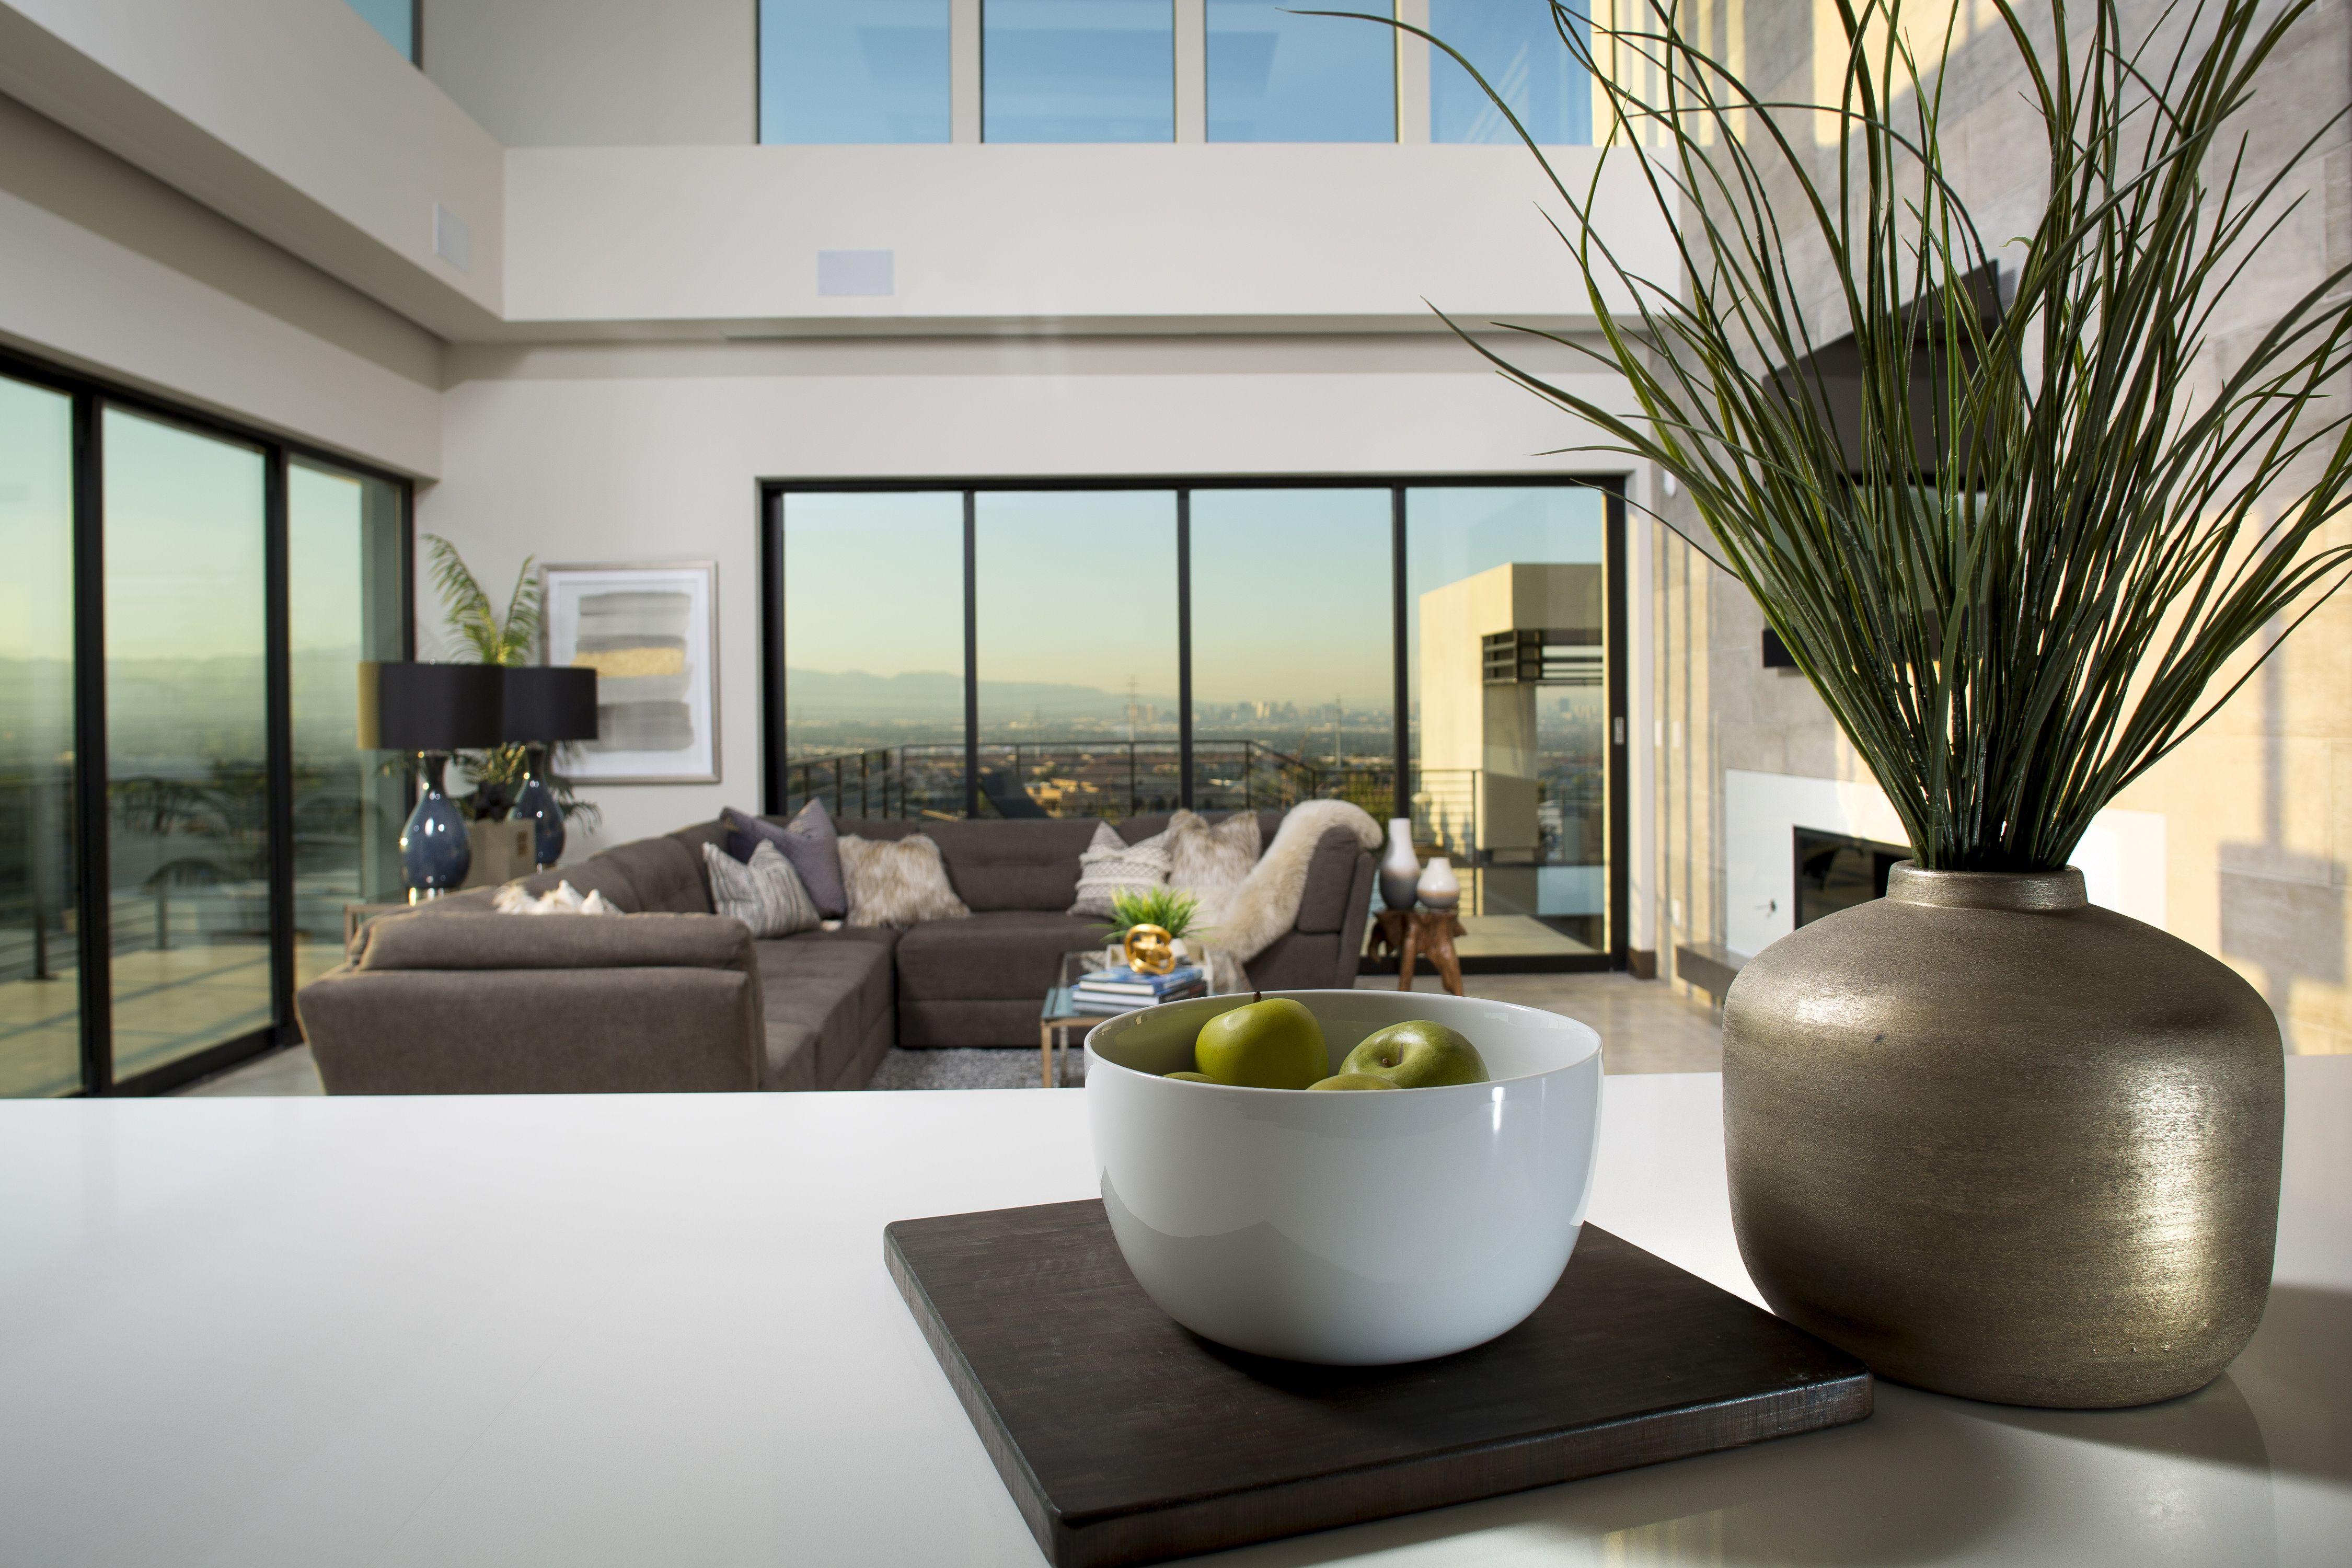 vegas trades las design renovation portfolio jobs home final contractor interior construction edits residential western